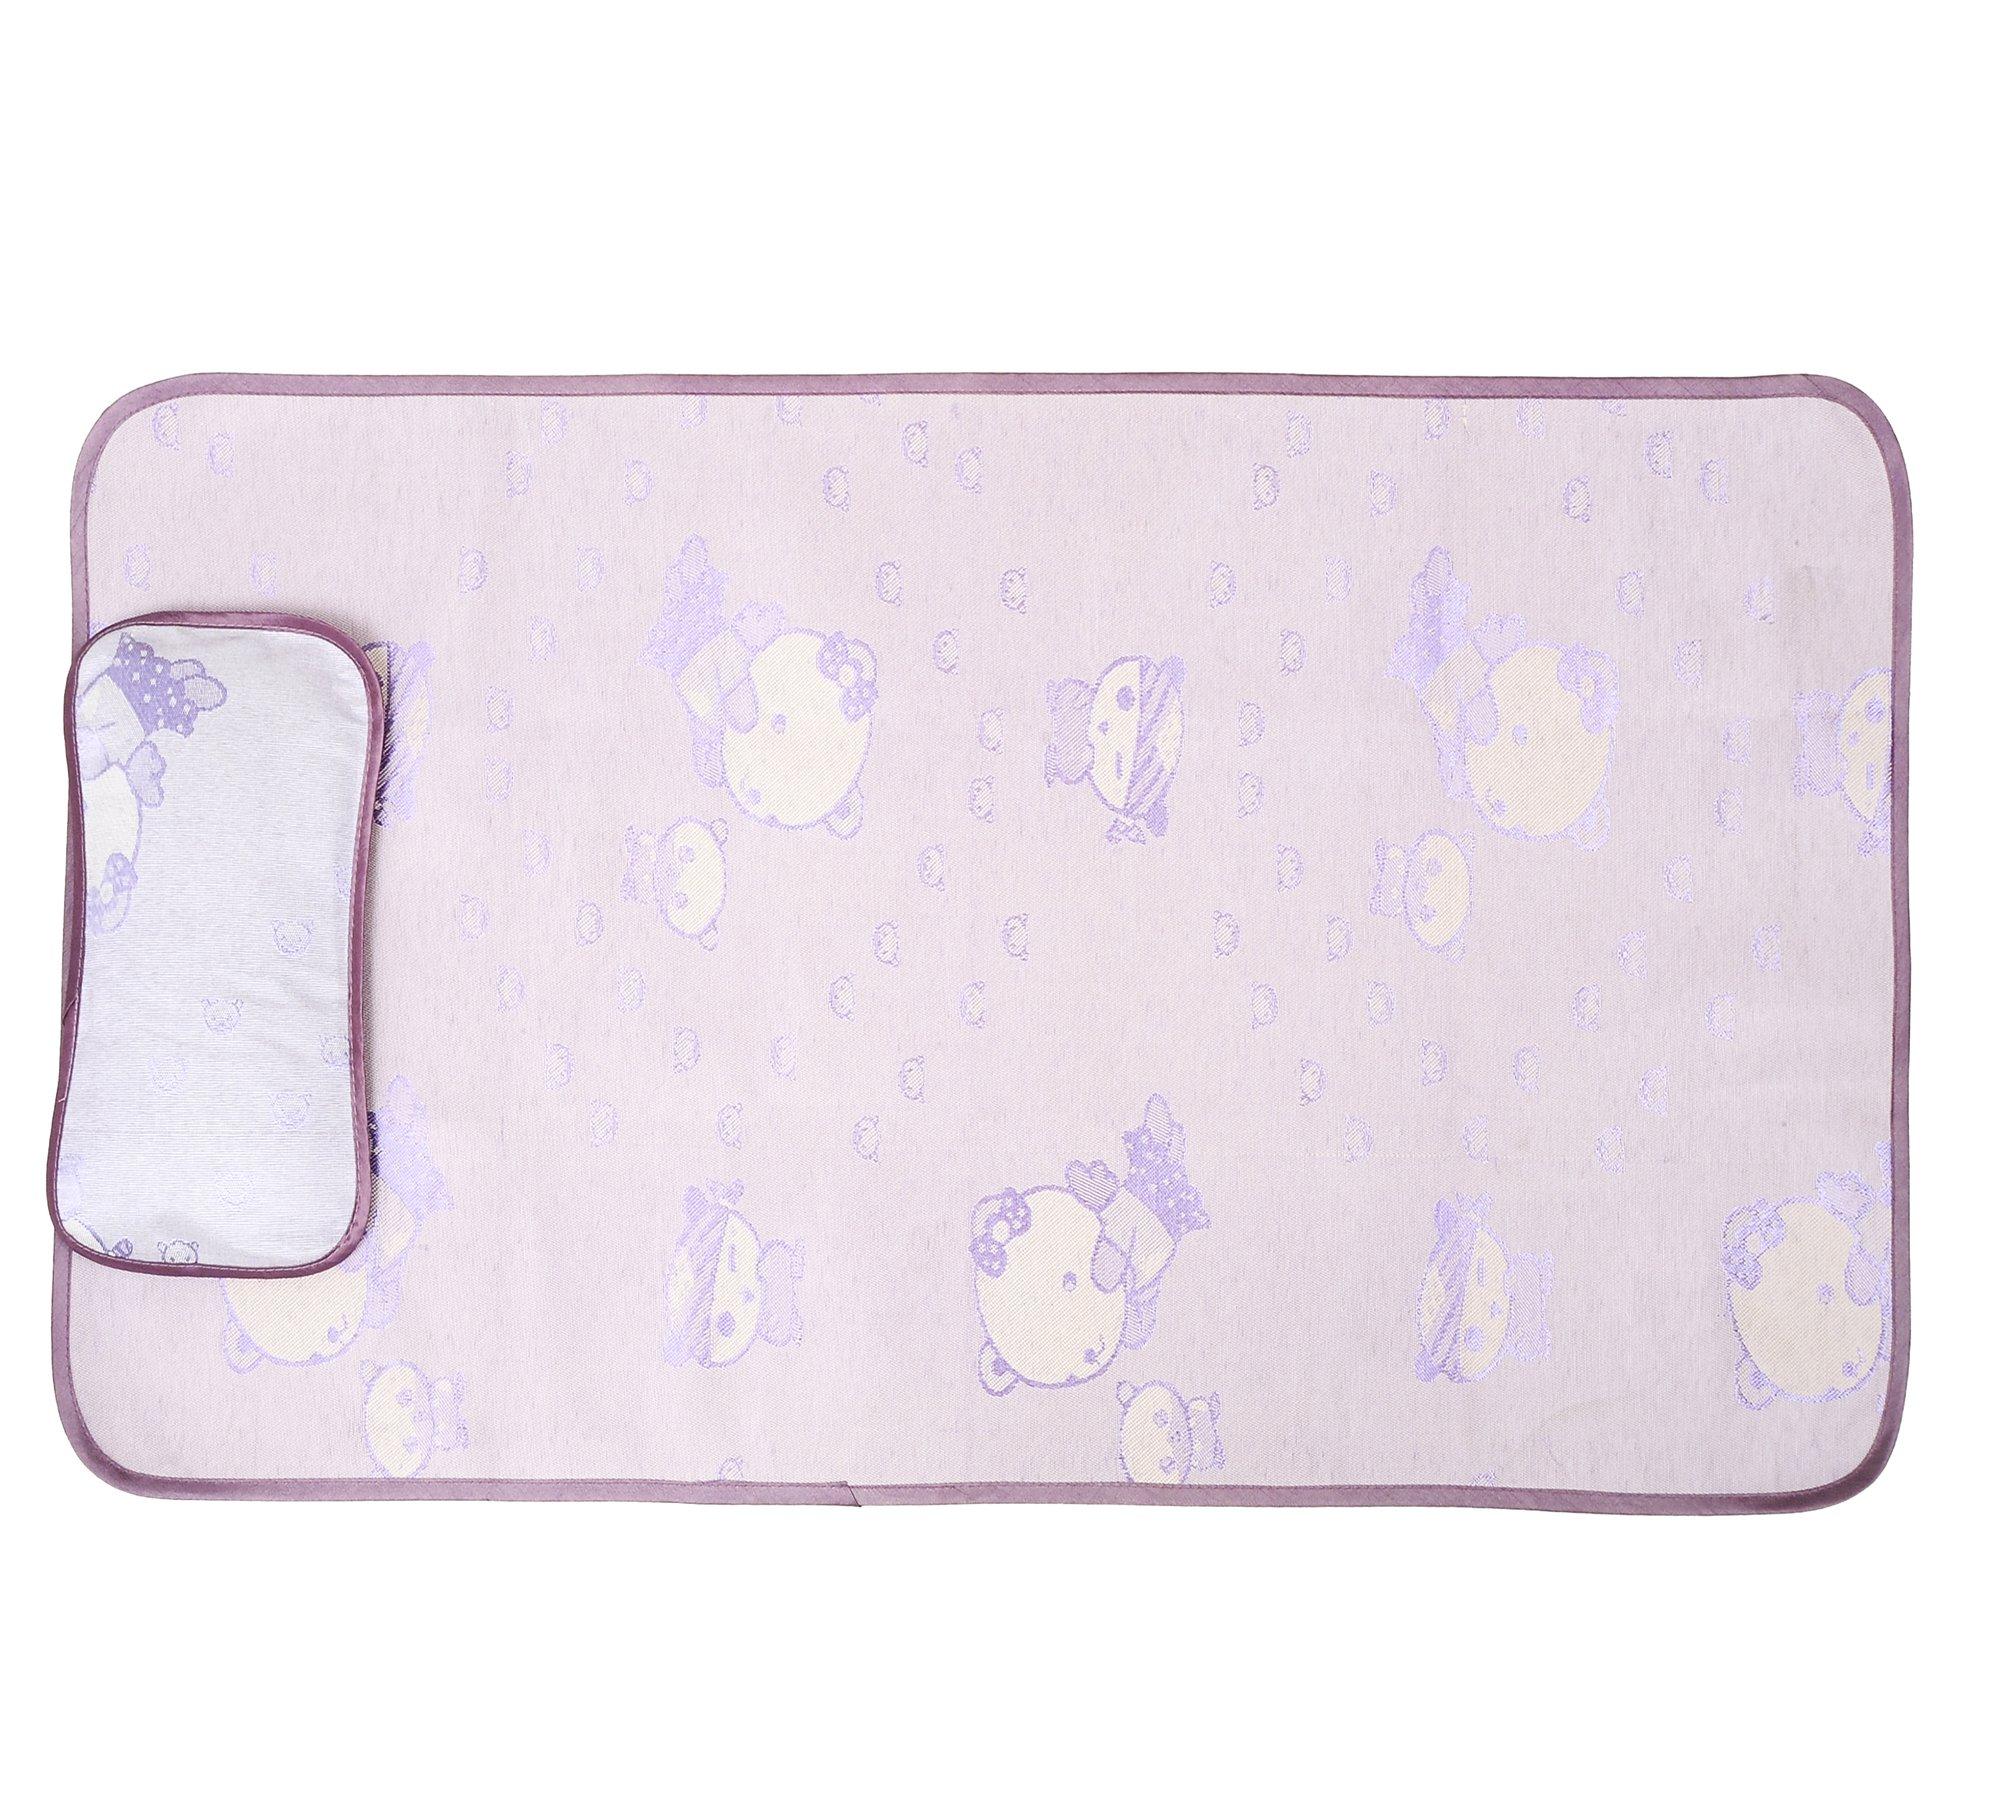 "Fairy Baby Flax Summer Cool Mat Baby Crib Pad 24"" Wx47 L,Purple Bear"